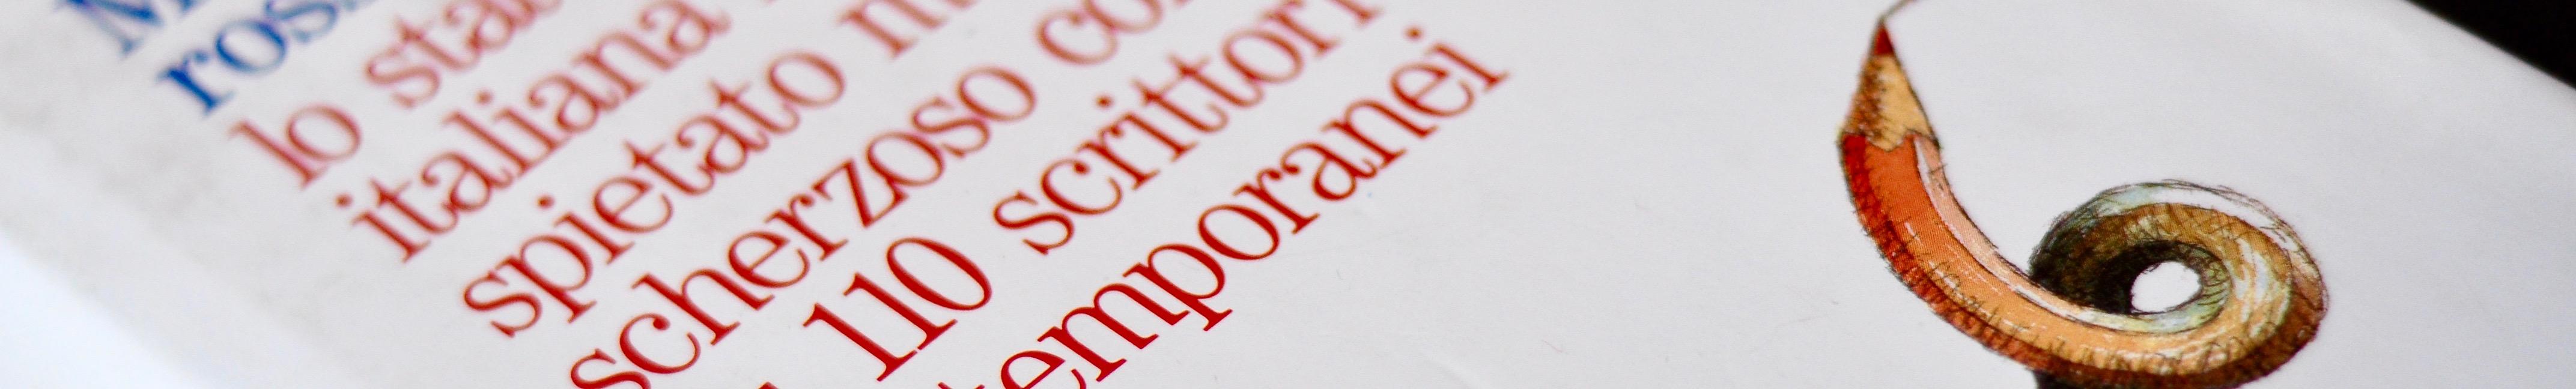 grammatica scrittori regole irregolarità